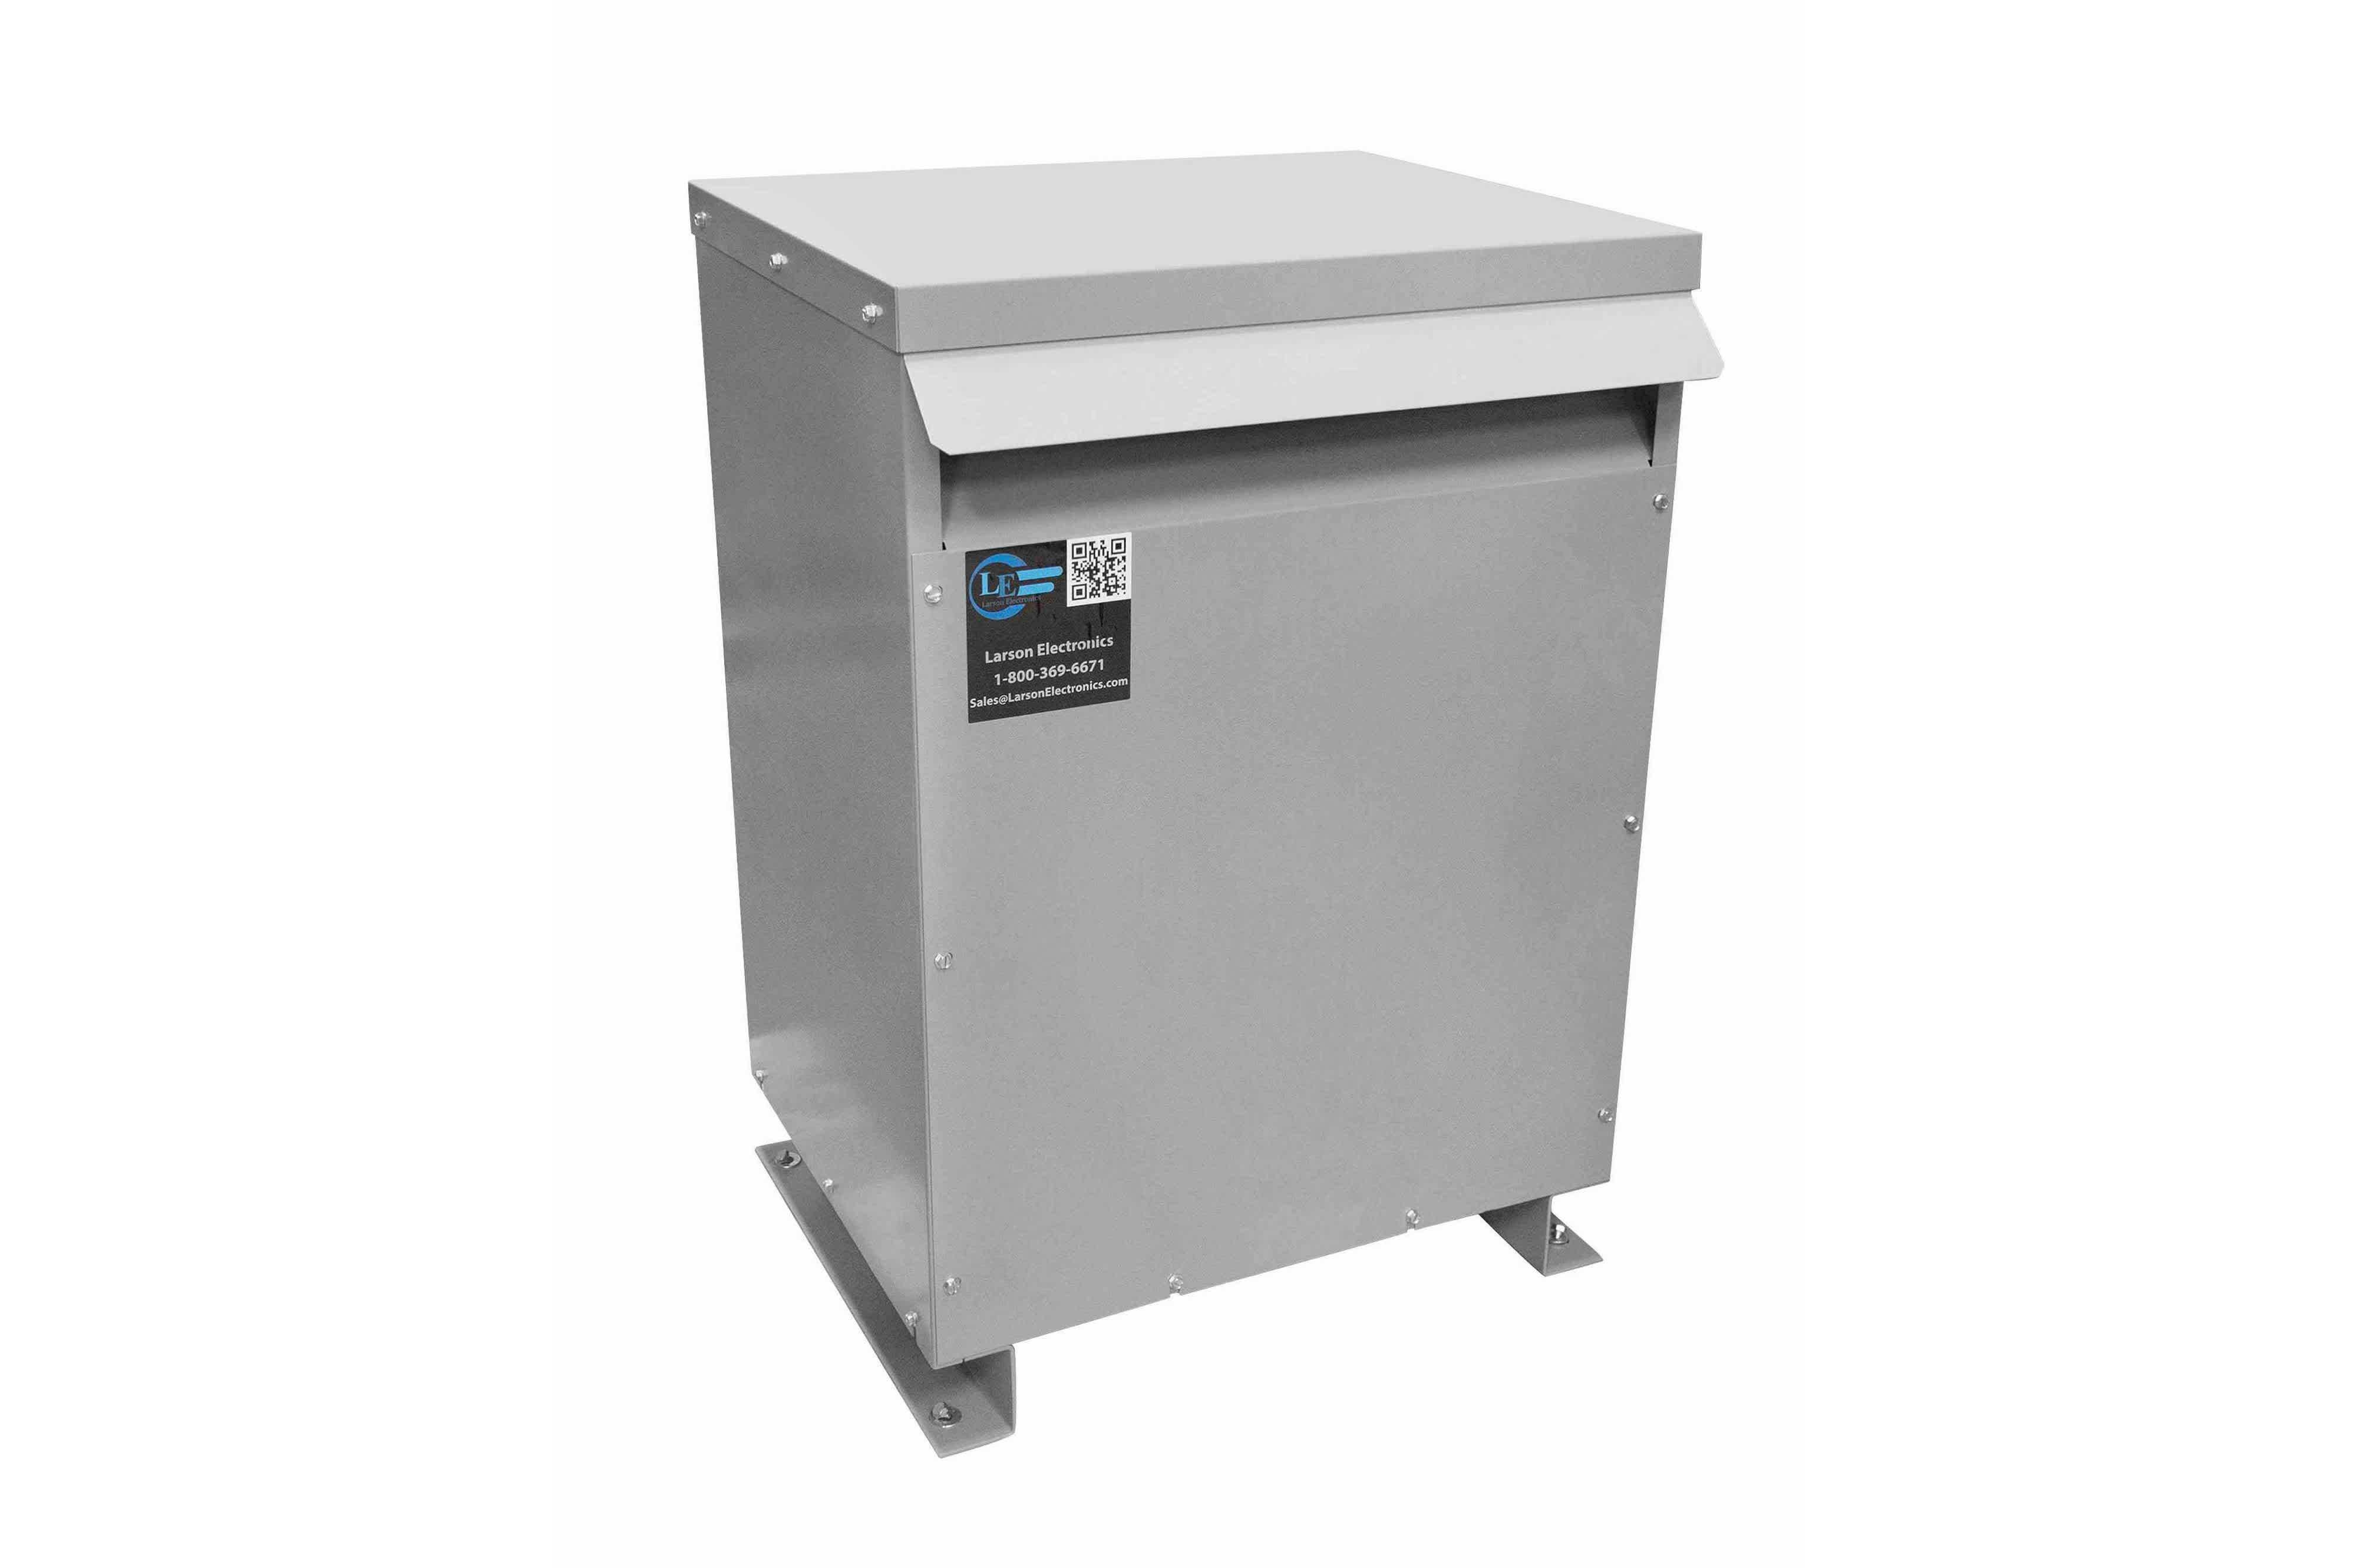 275 kVA 3PH Isolation Transformer, 208V Wye Primary, 600Y/347 Wye-N Secondary, N3R, Ventilated, 60 Hz